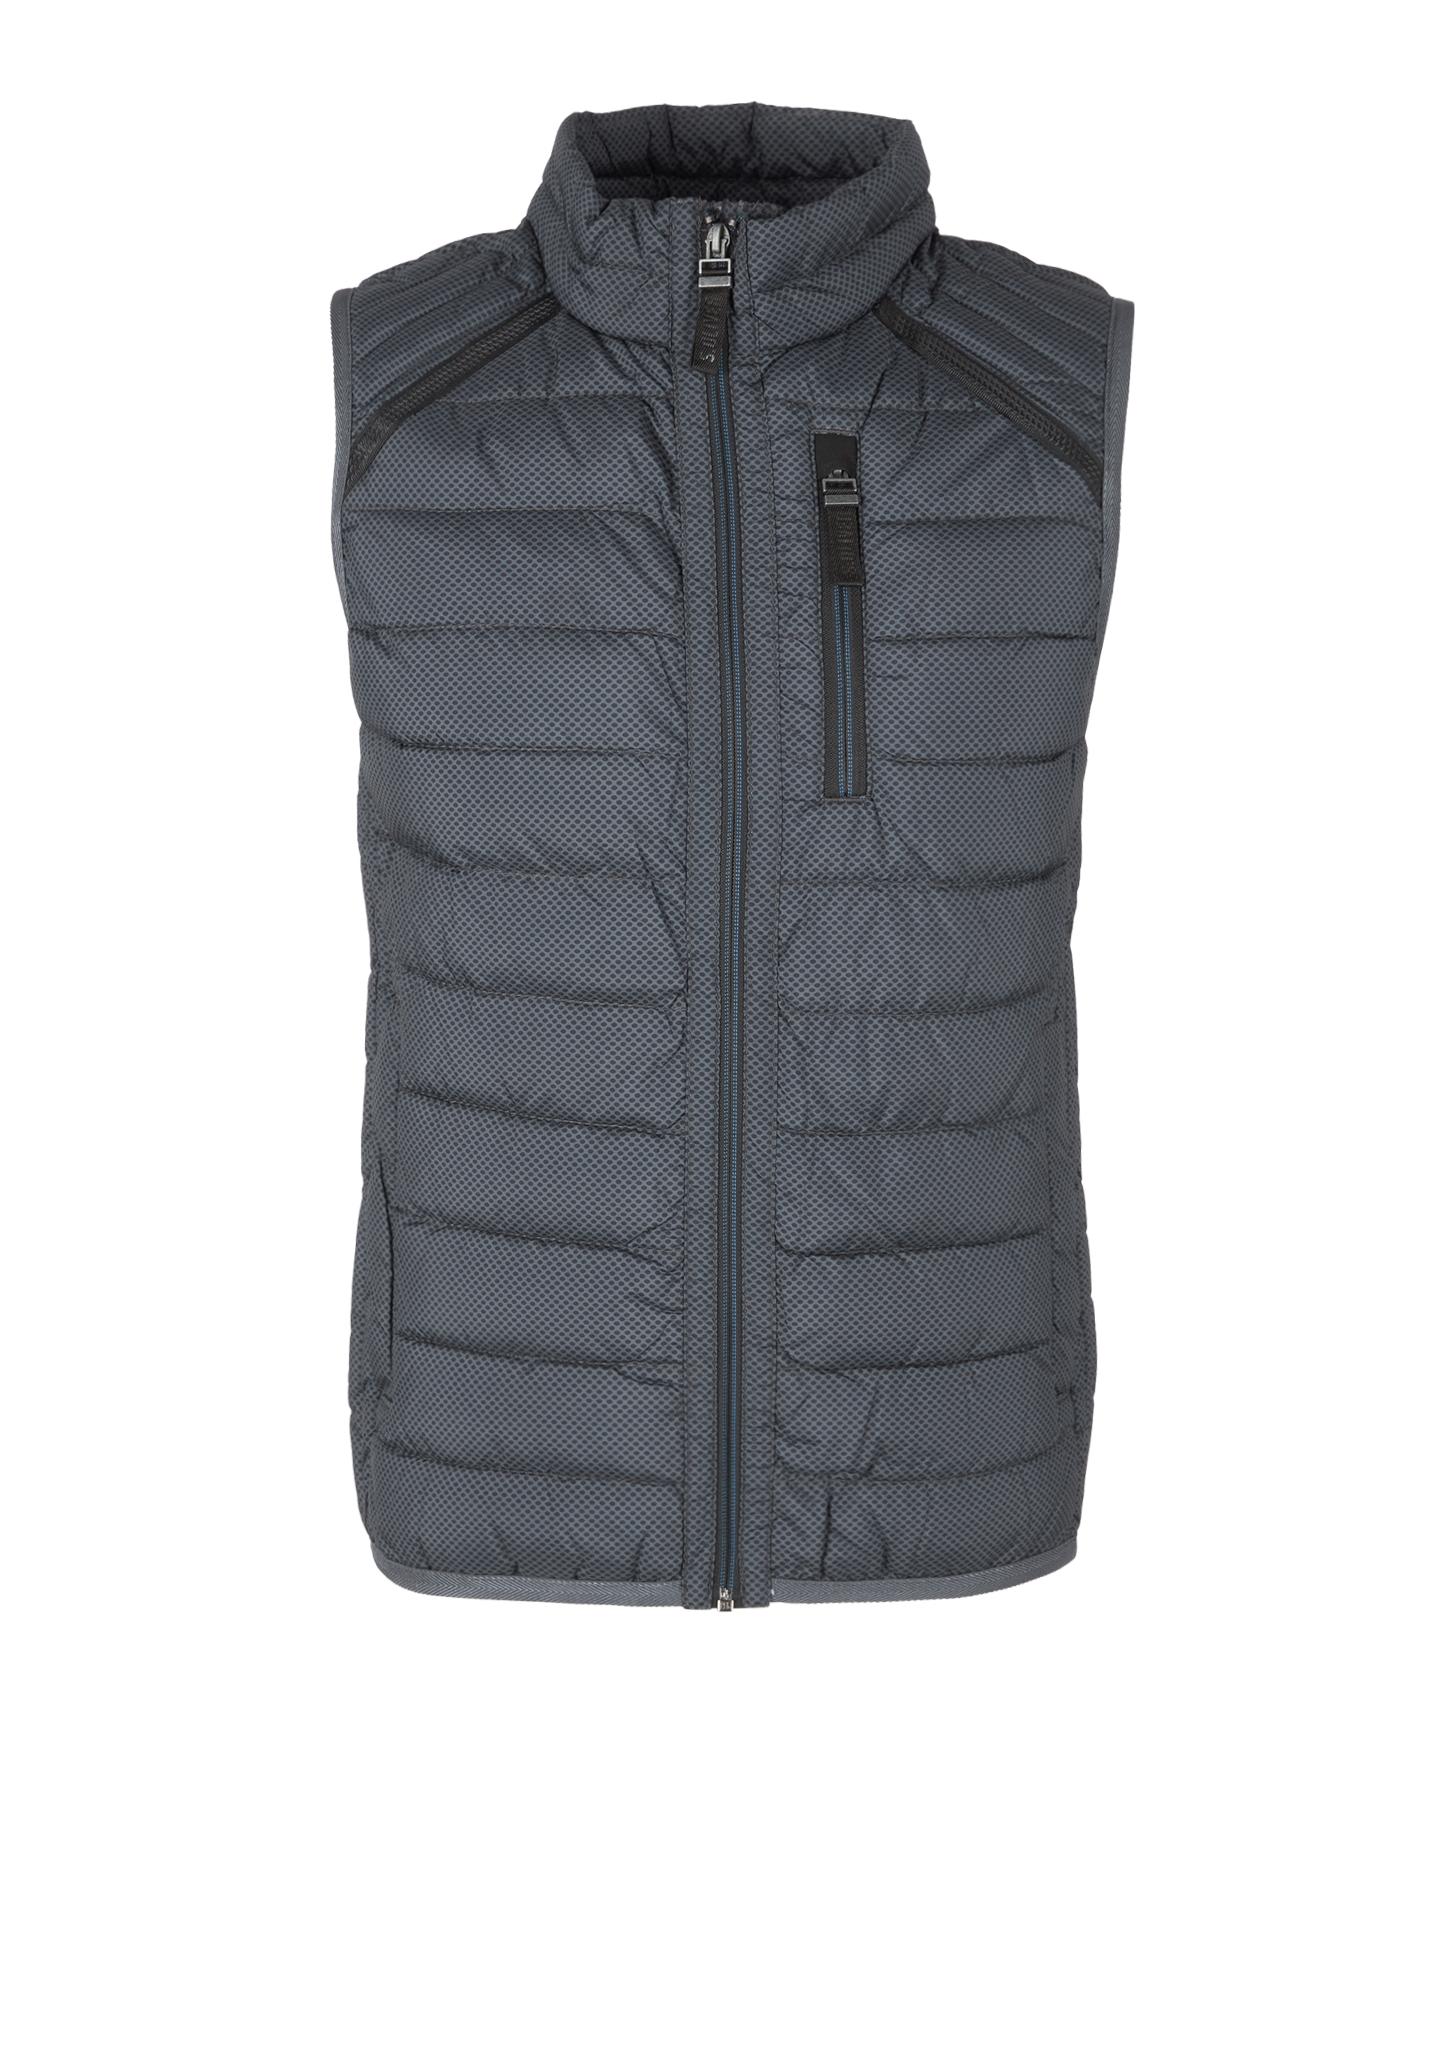 Steppweste | Bekleidung > Westen > Steppwesten | Grau | Obermaterial 100% polyester| futter 100% polyamid| füllmaterial 100% polyester | s.Oliver